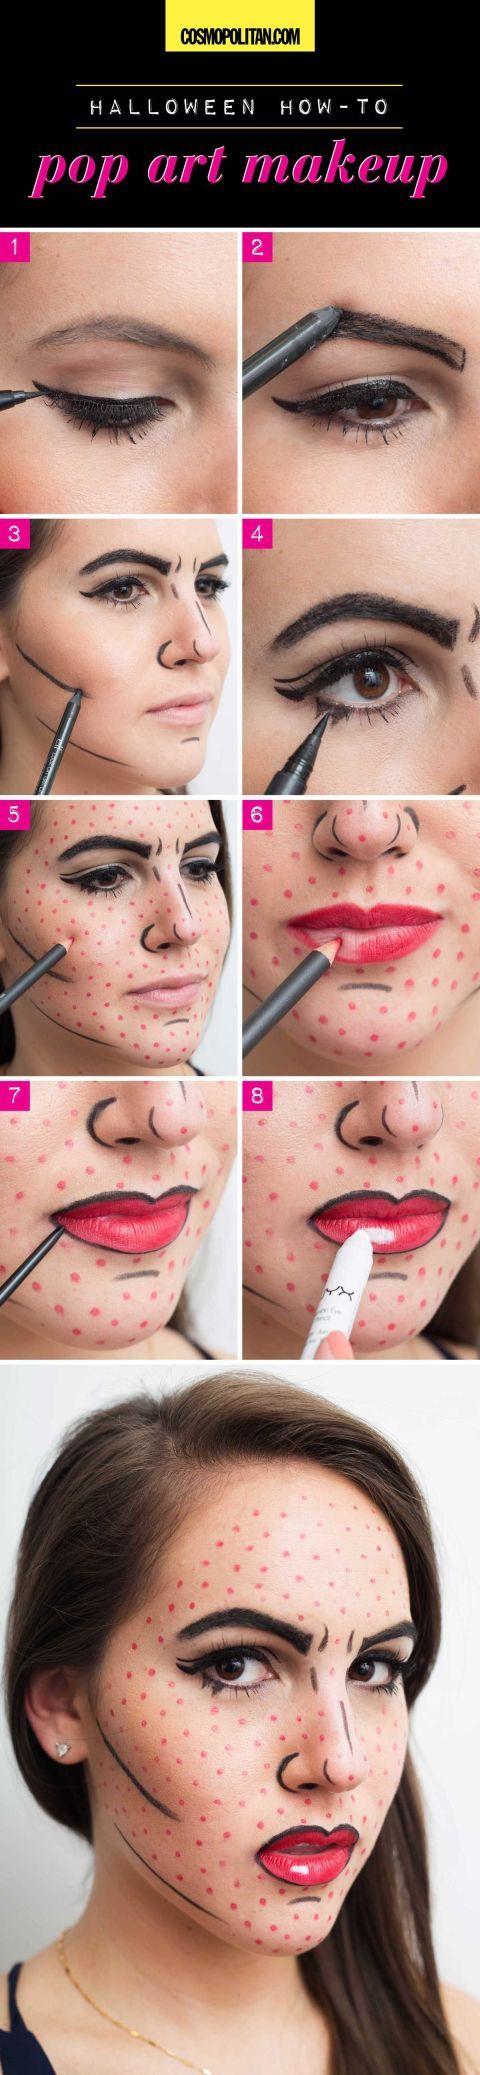 8 Easy Halloween Makeup Ideas - Halloween Makeup Tutorials With Makeup You Already Have